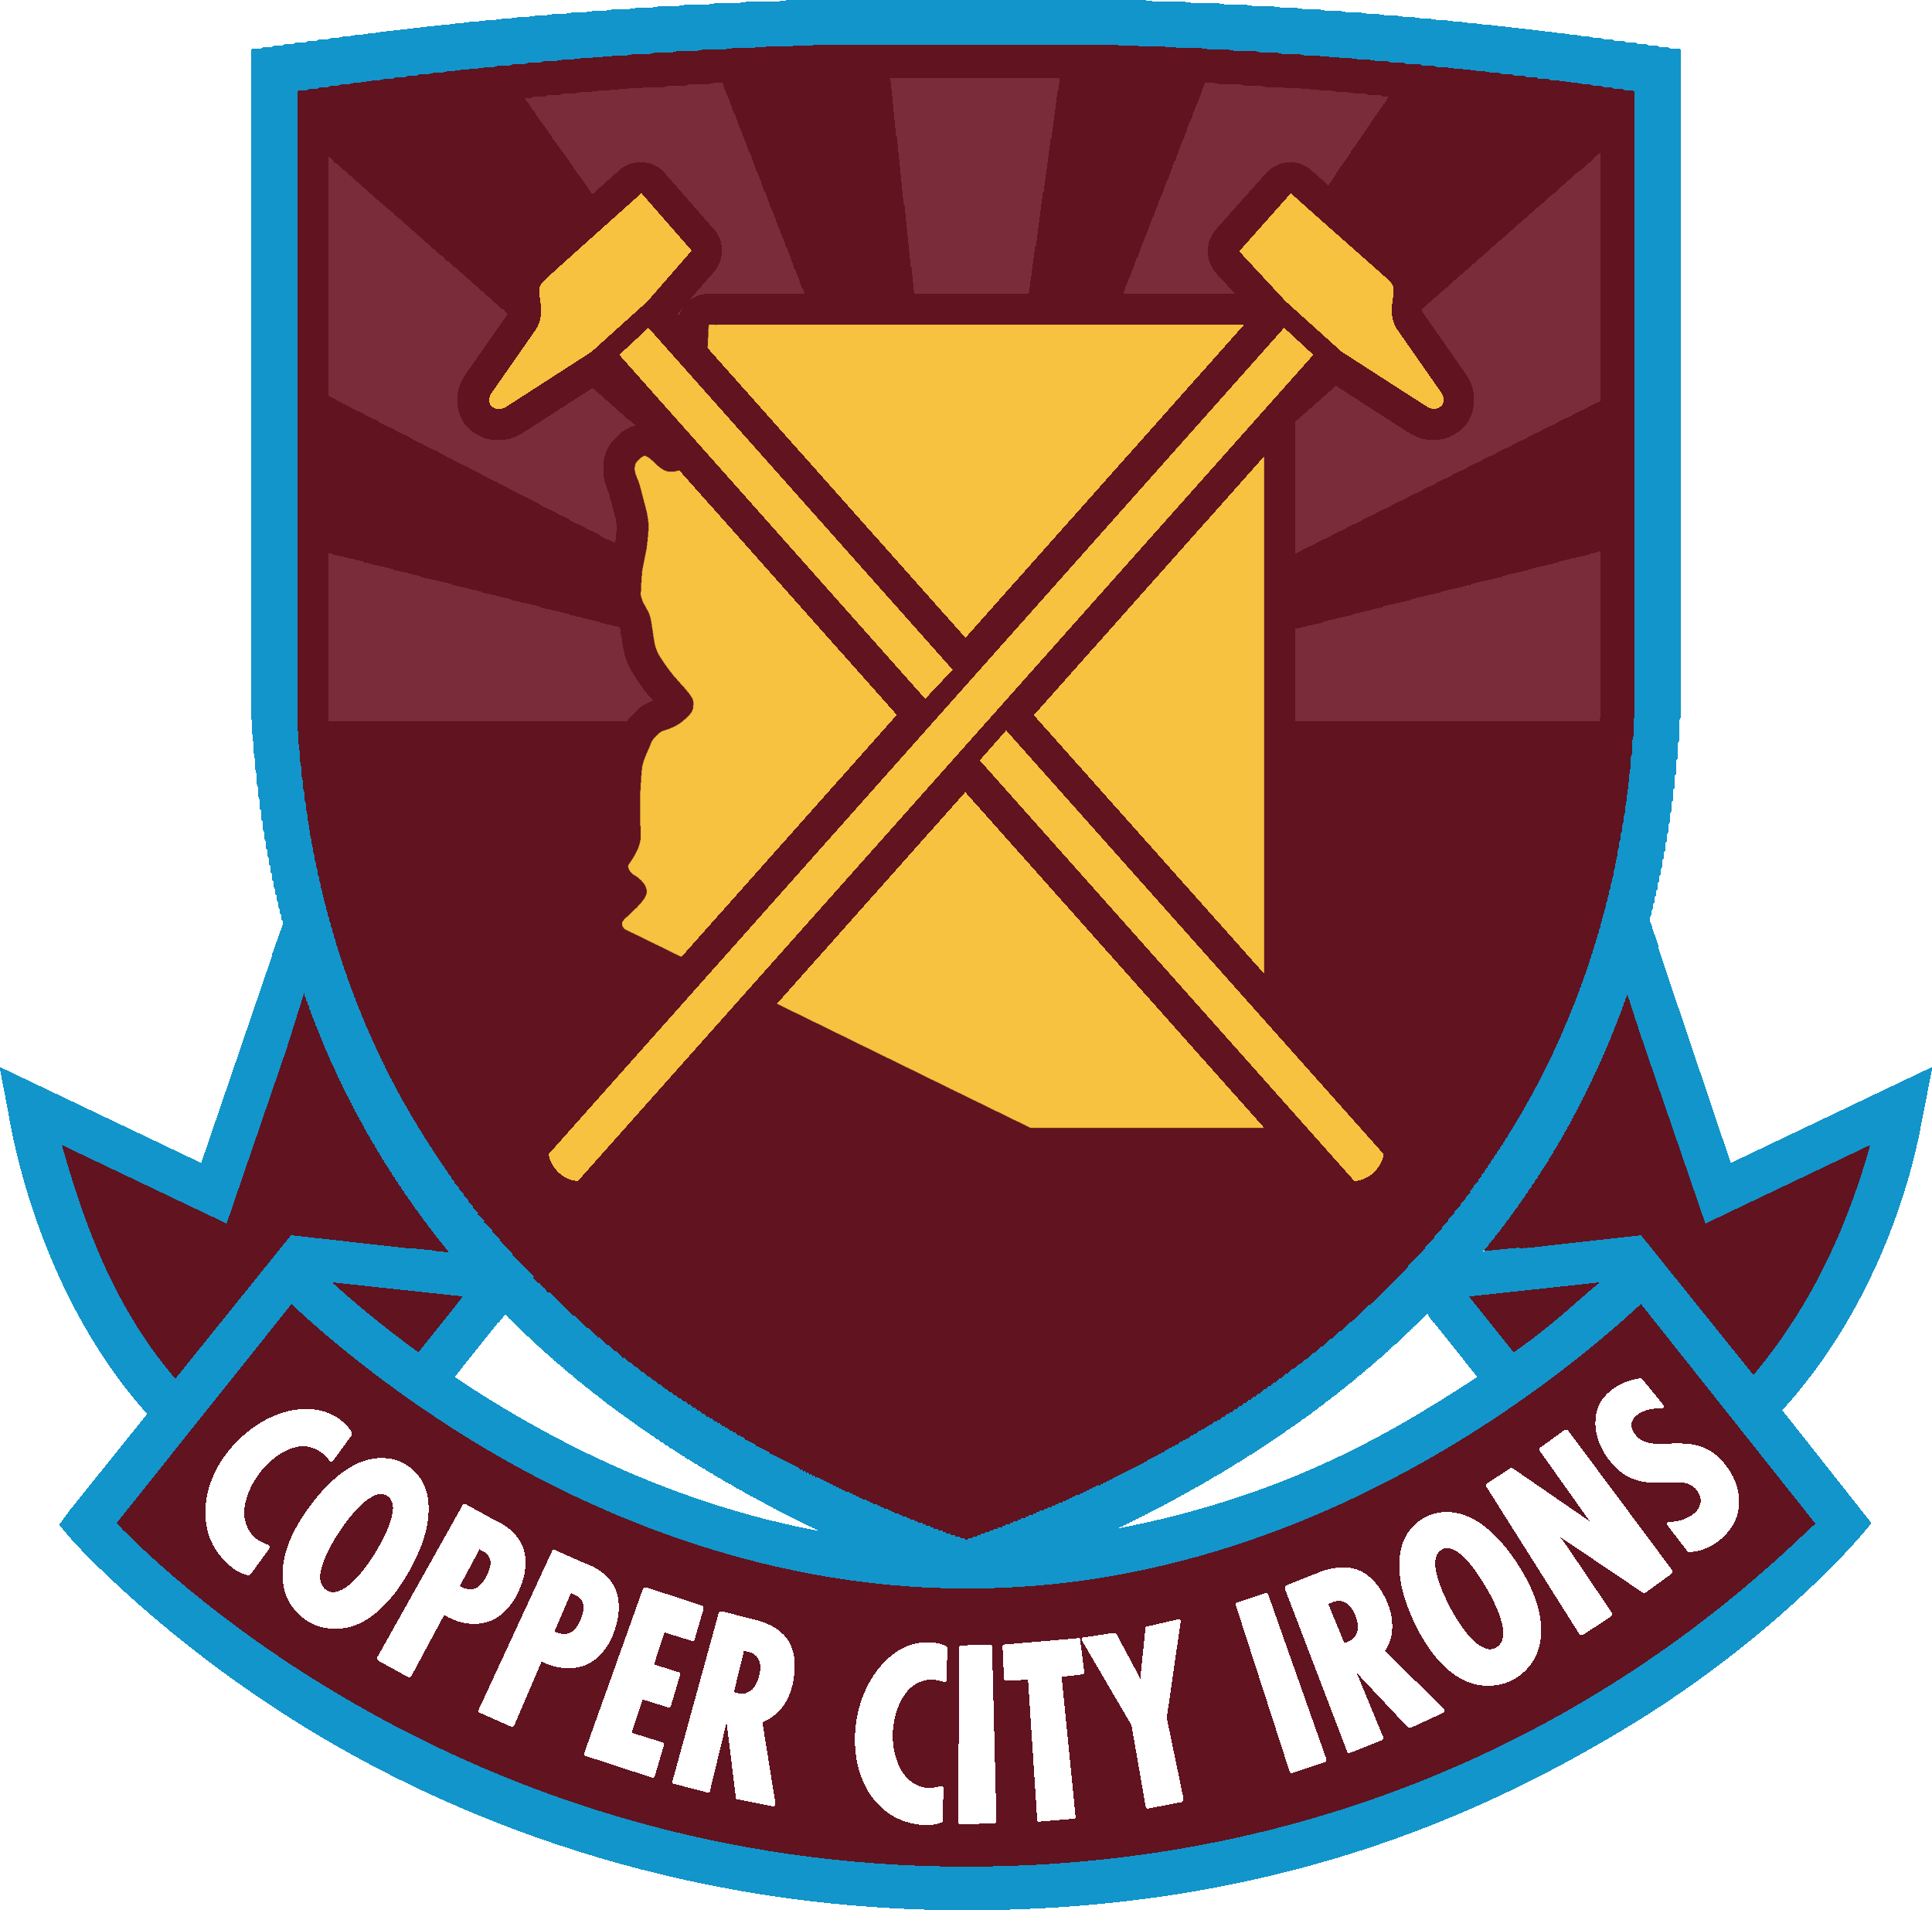 CopperCityIrons